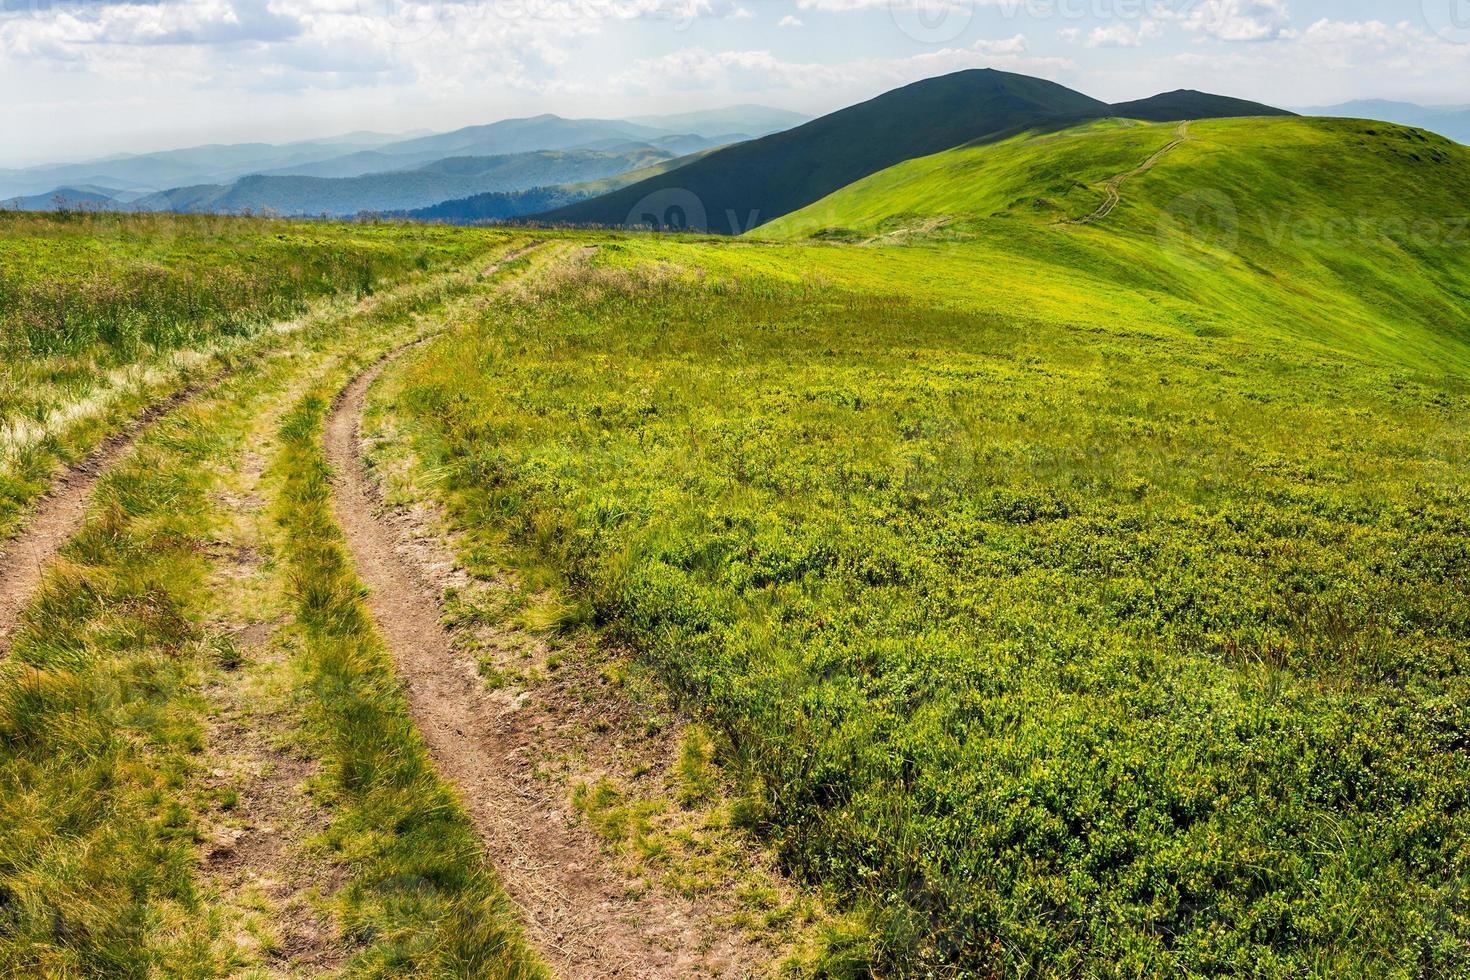 Weg auf dem Berggipfel foto